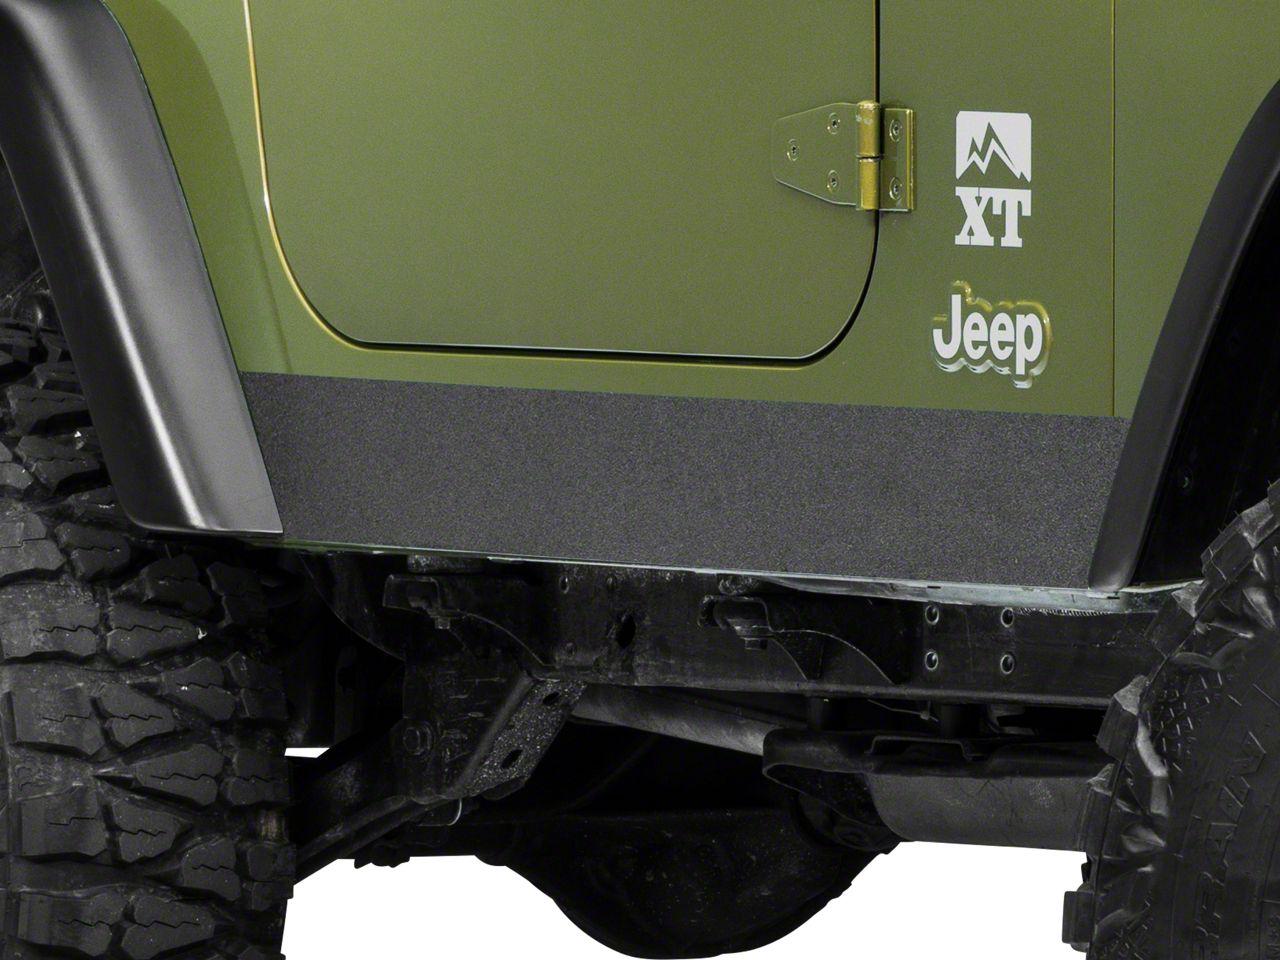 Barricade Rocker Body Shield Decal (97-06 Jeep Wrangler TJ)